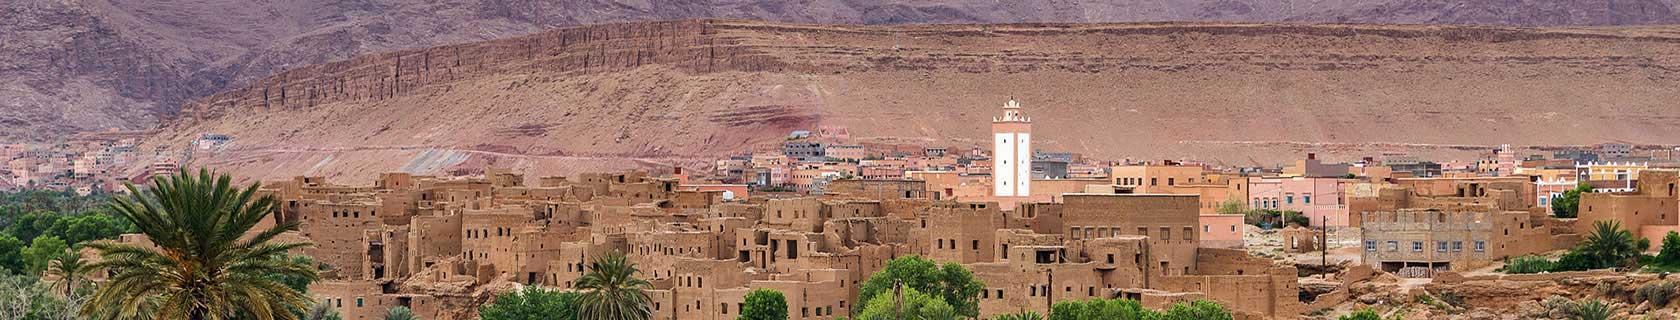 Morocco-ouarzazate-trip